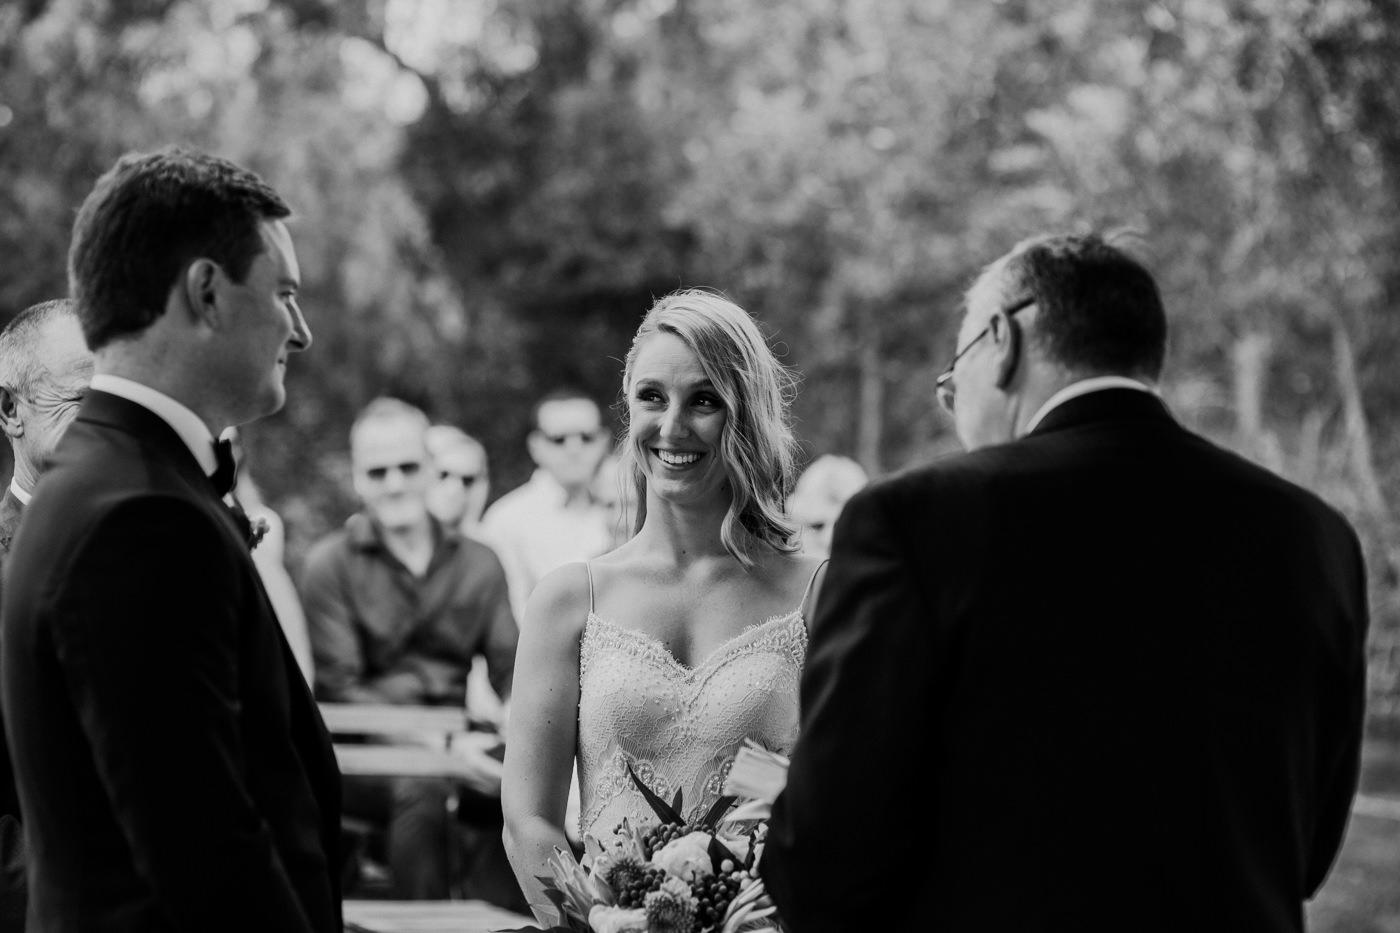 Anthony & Eliet - Wagga Wagga Wedding - Country NSW - Samantha Heather Photography-99.jpg